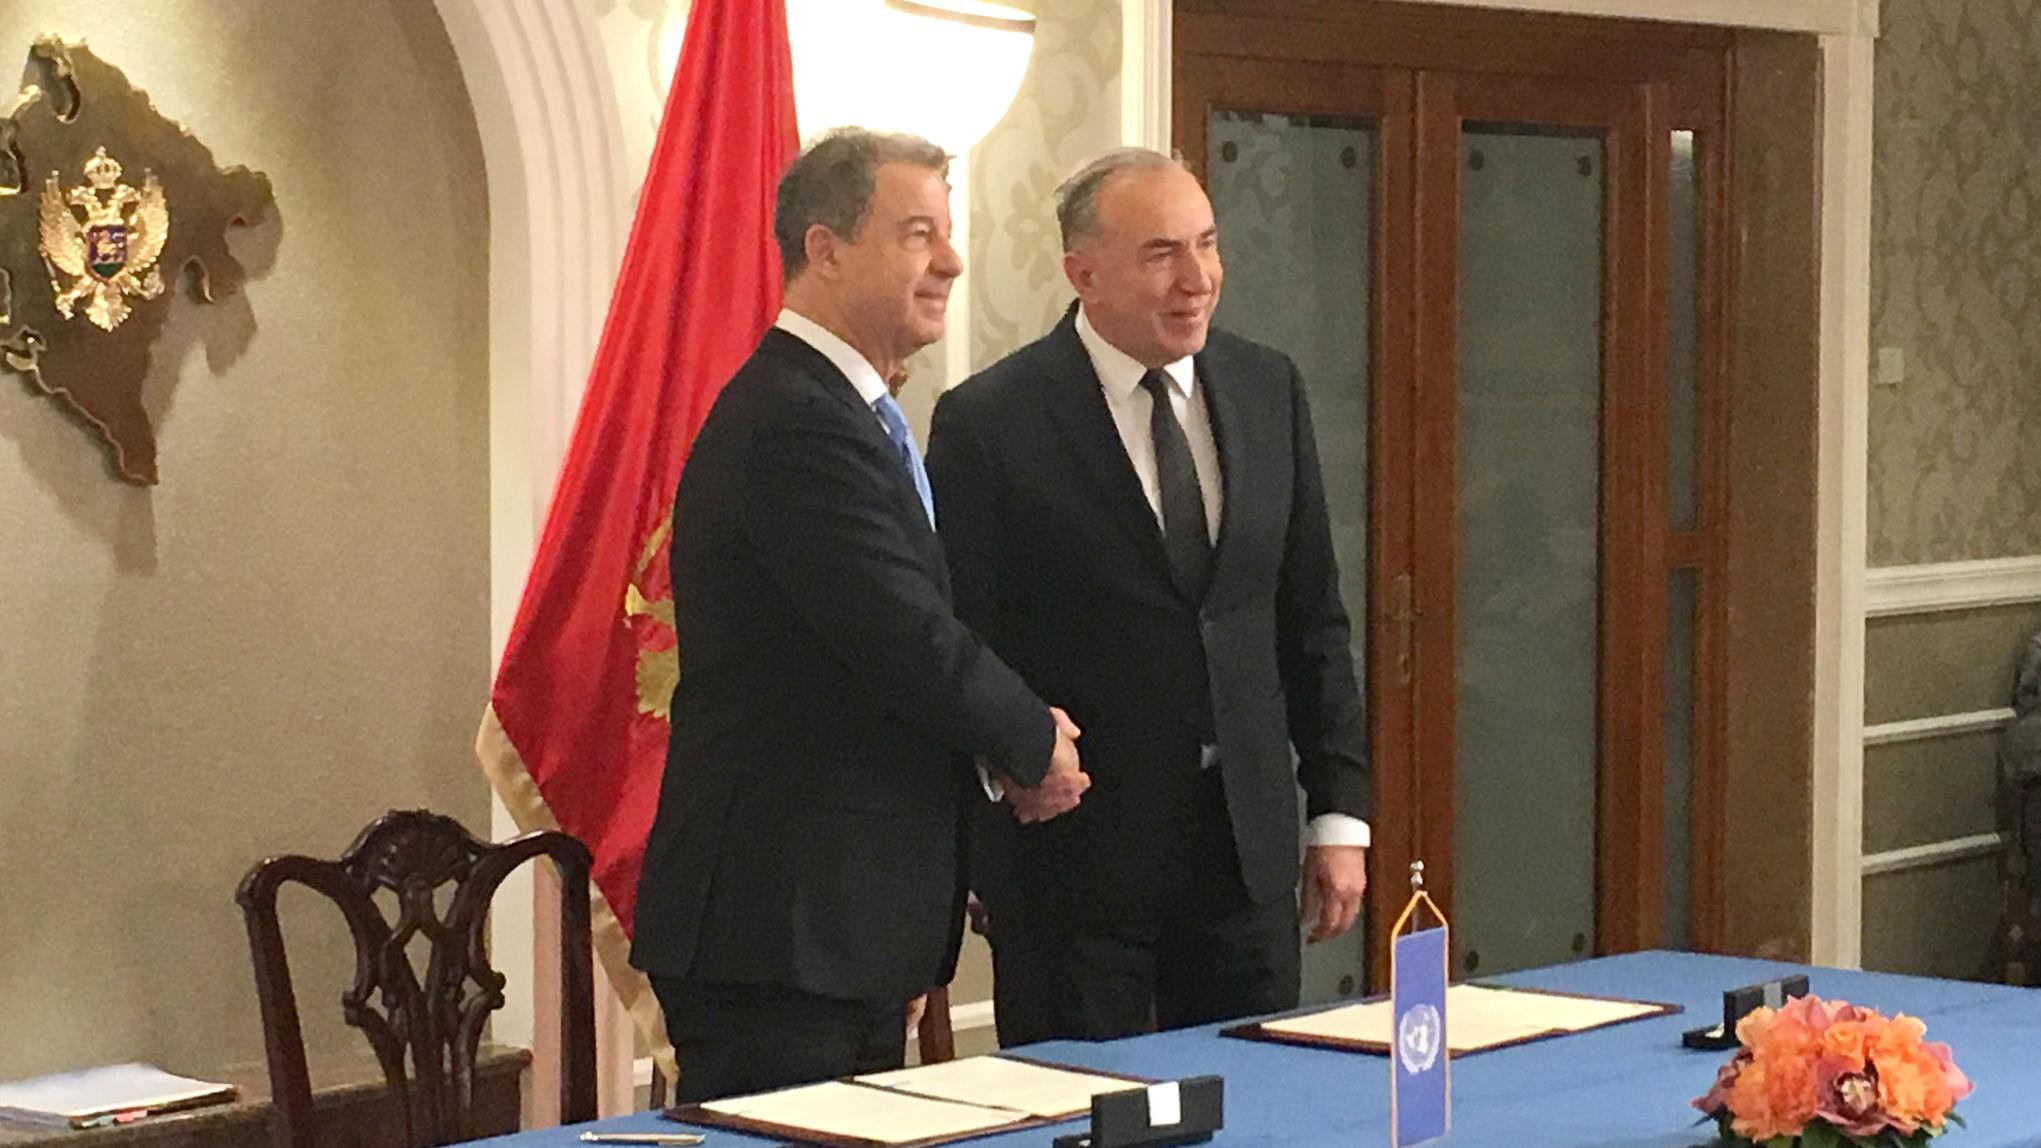 Glavni tužilac Mehanizma, Serge Brammertz i vrhovni državni tužilac Crne Gore Ivica Stanković